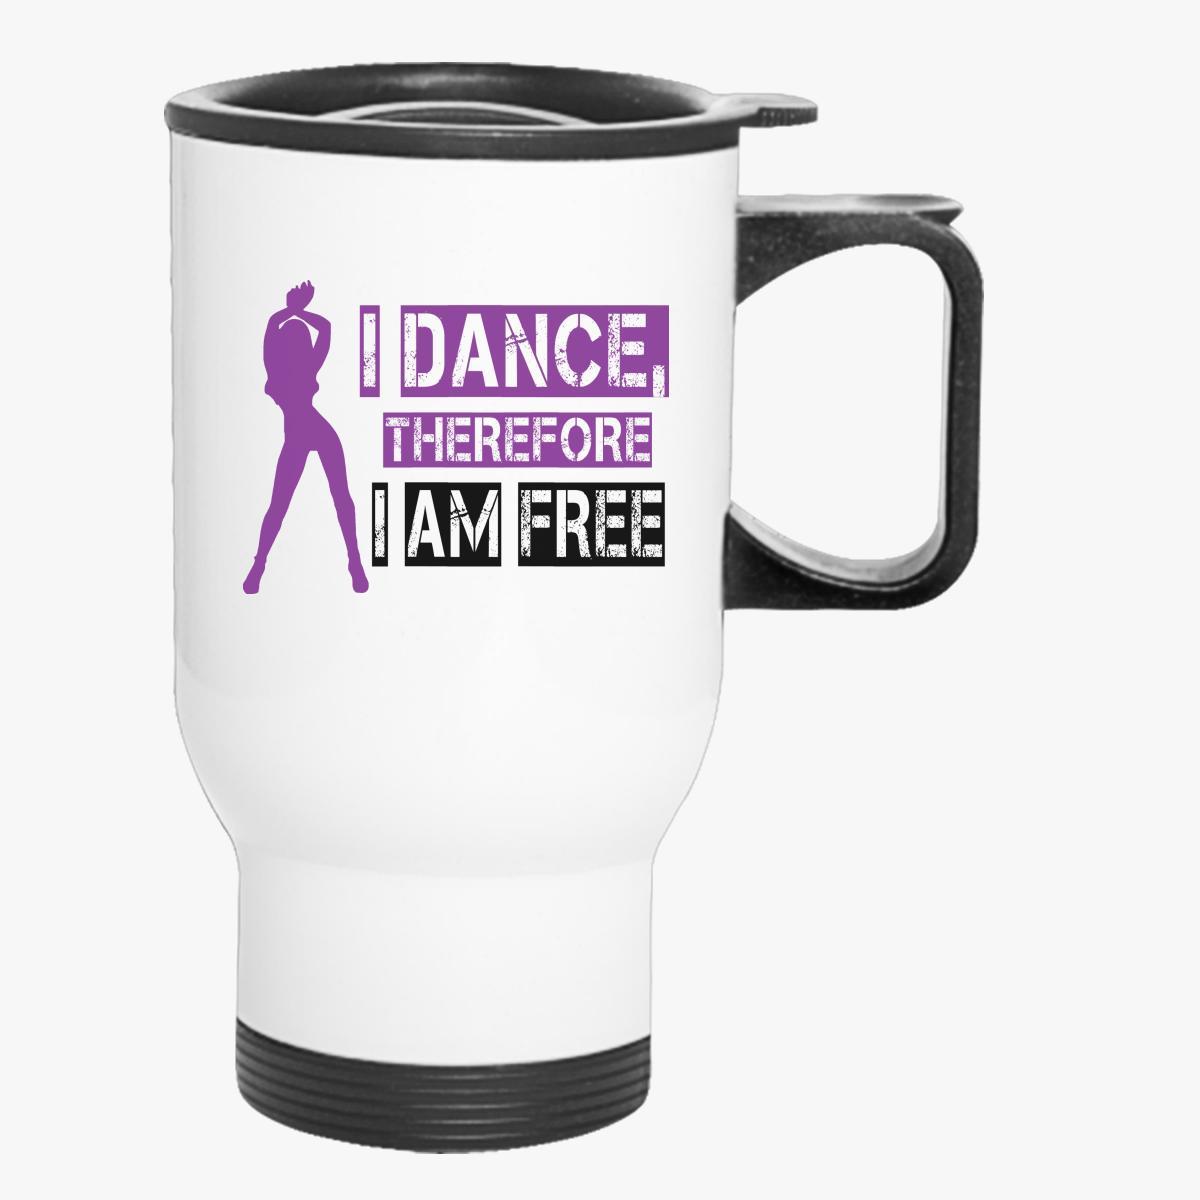 Buy DANCE, THEREFORE AM FREE Travel Mug, 72450